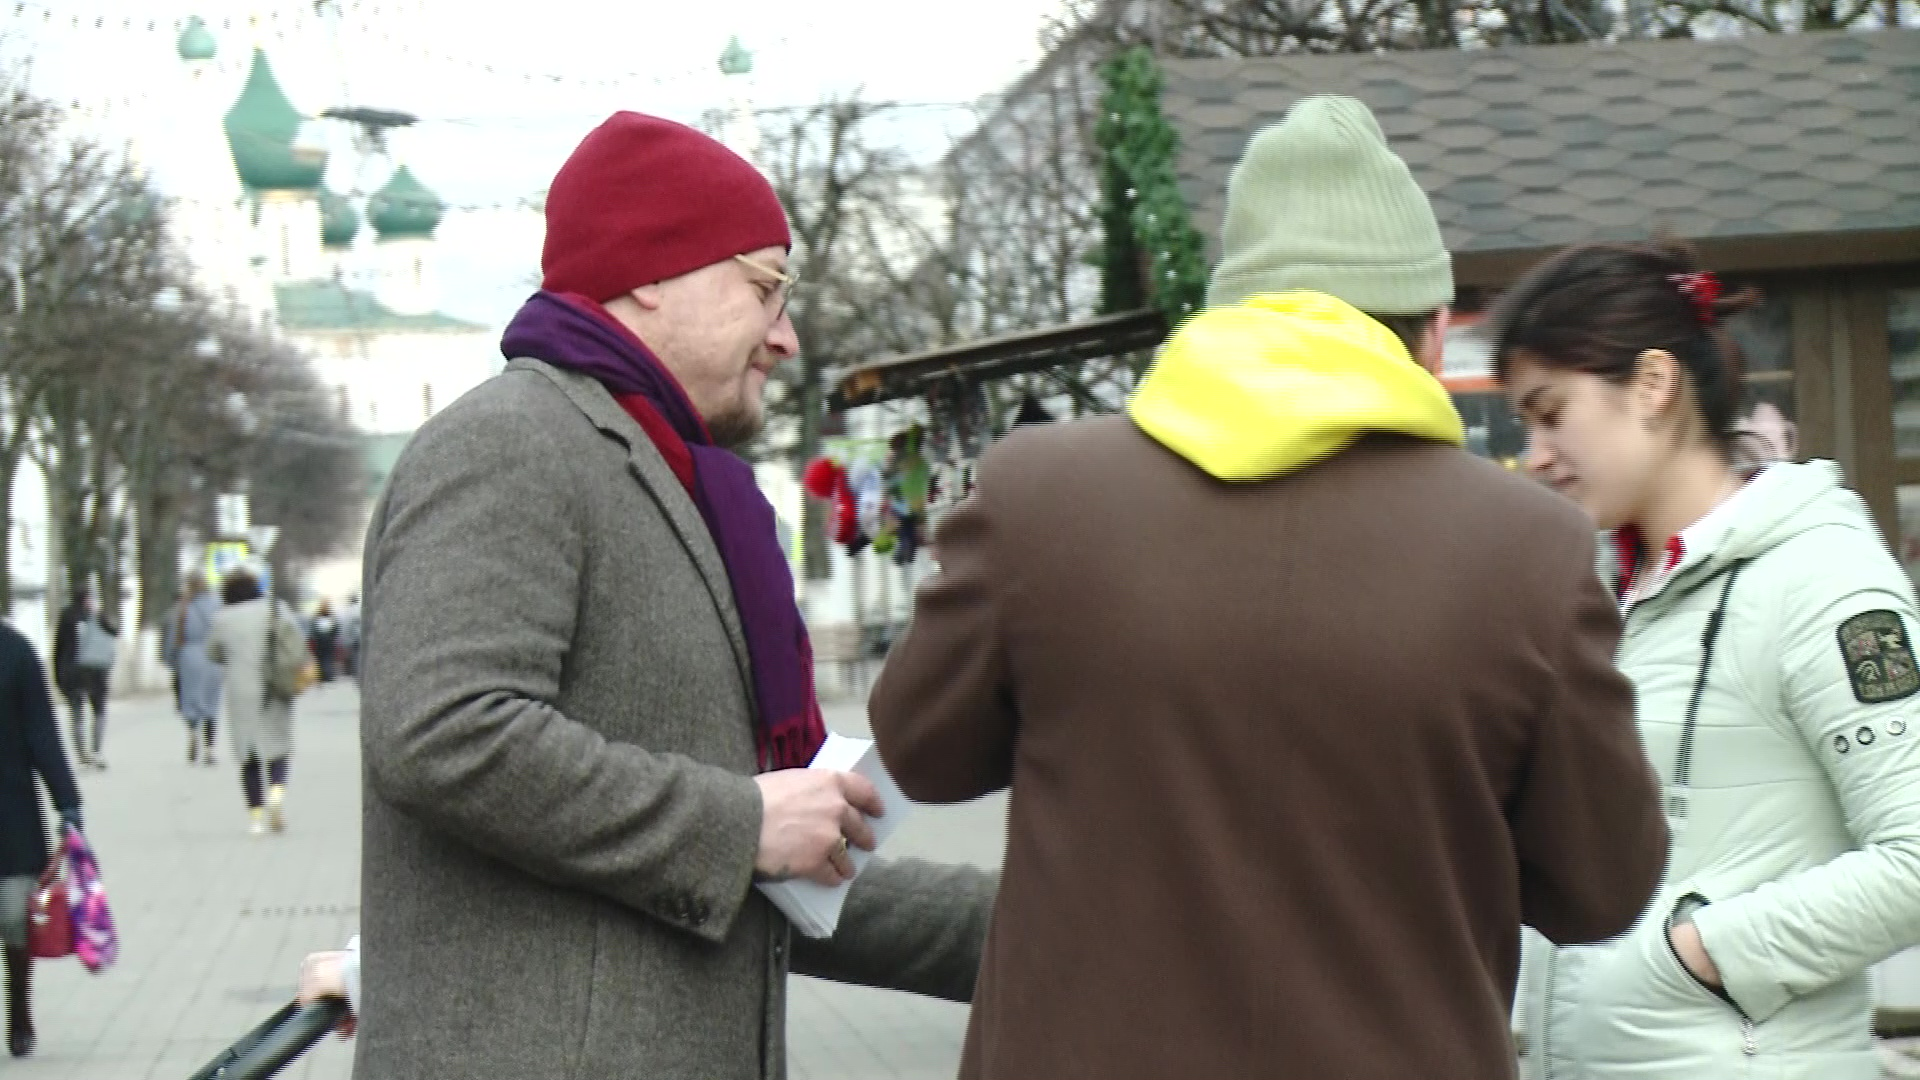 Двое ярославцев устроили акцию по раздаче медицинских масок